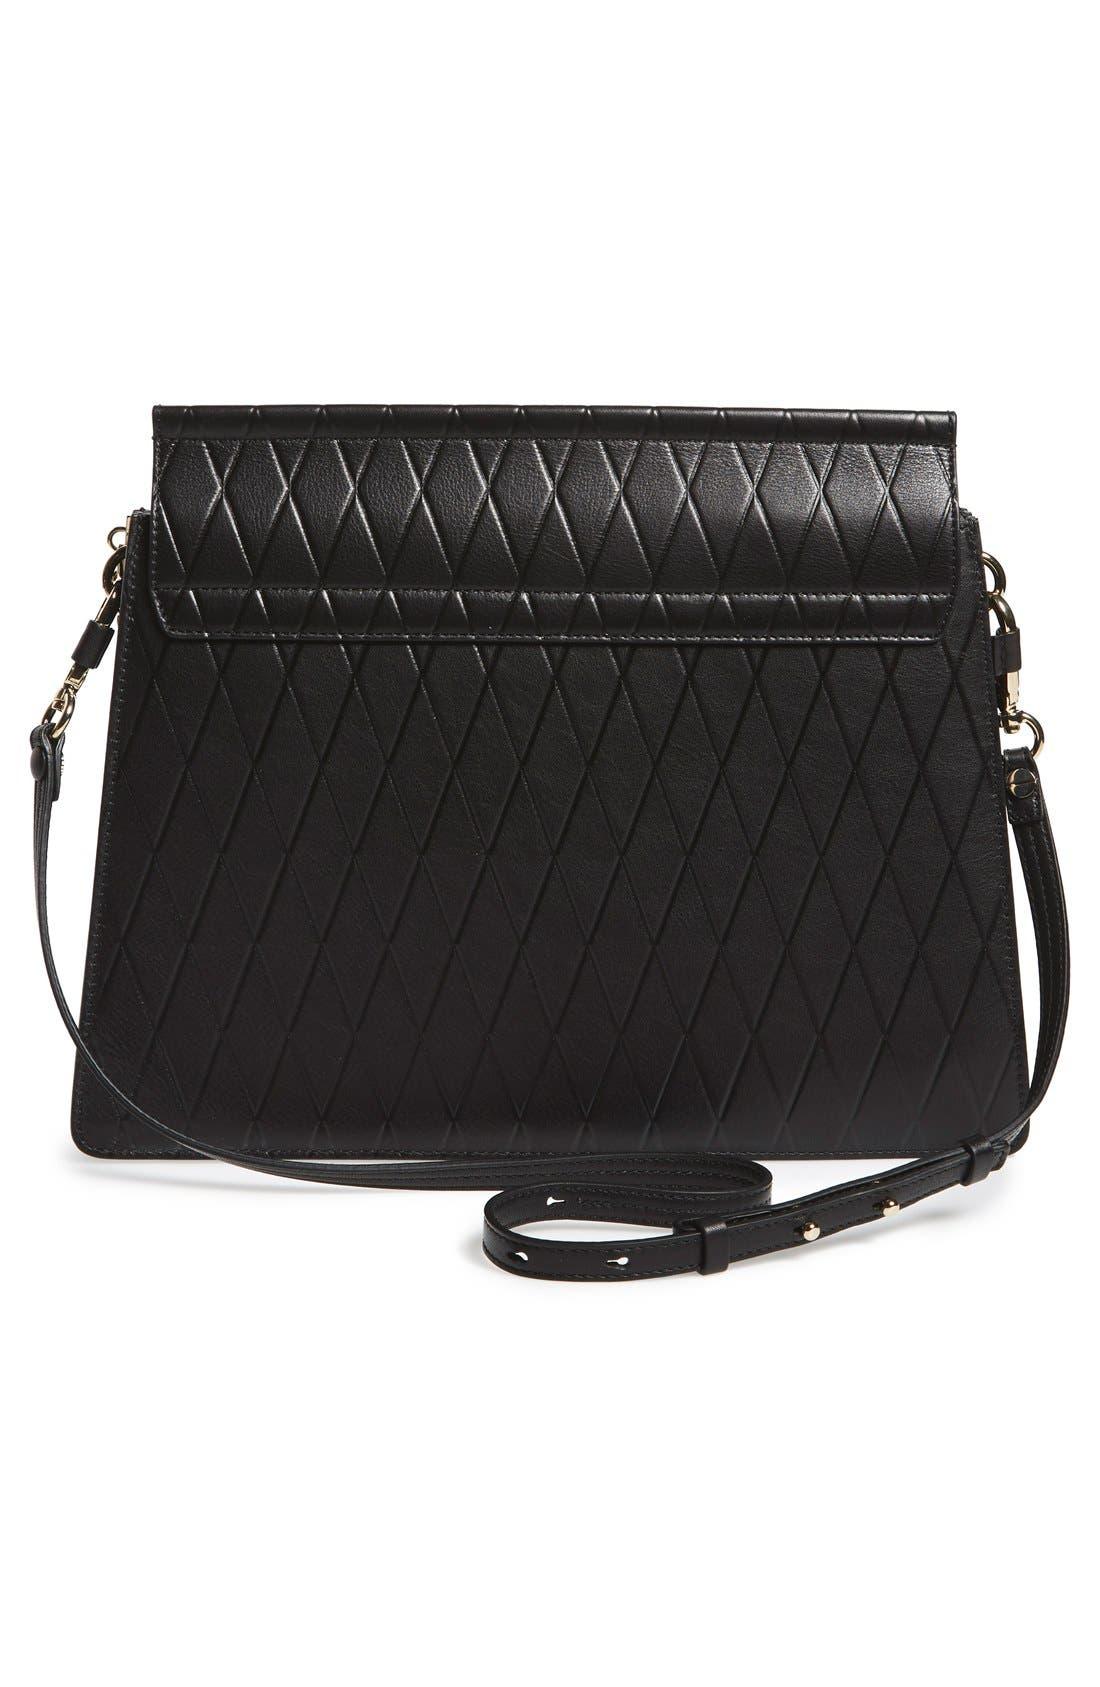 Alternate Image 3  - Chloé 'Medium Faye' Diamond Embossed Leather Shoulder Bag